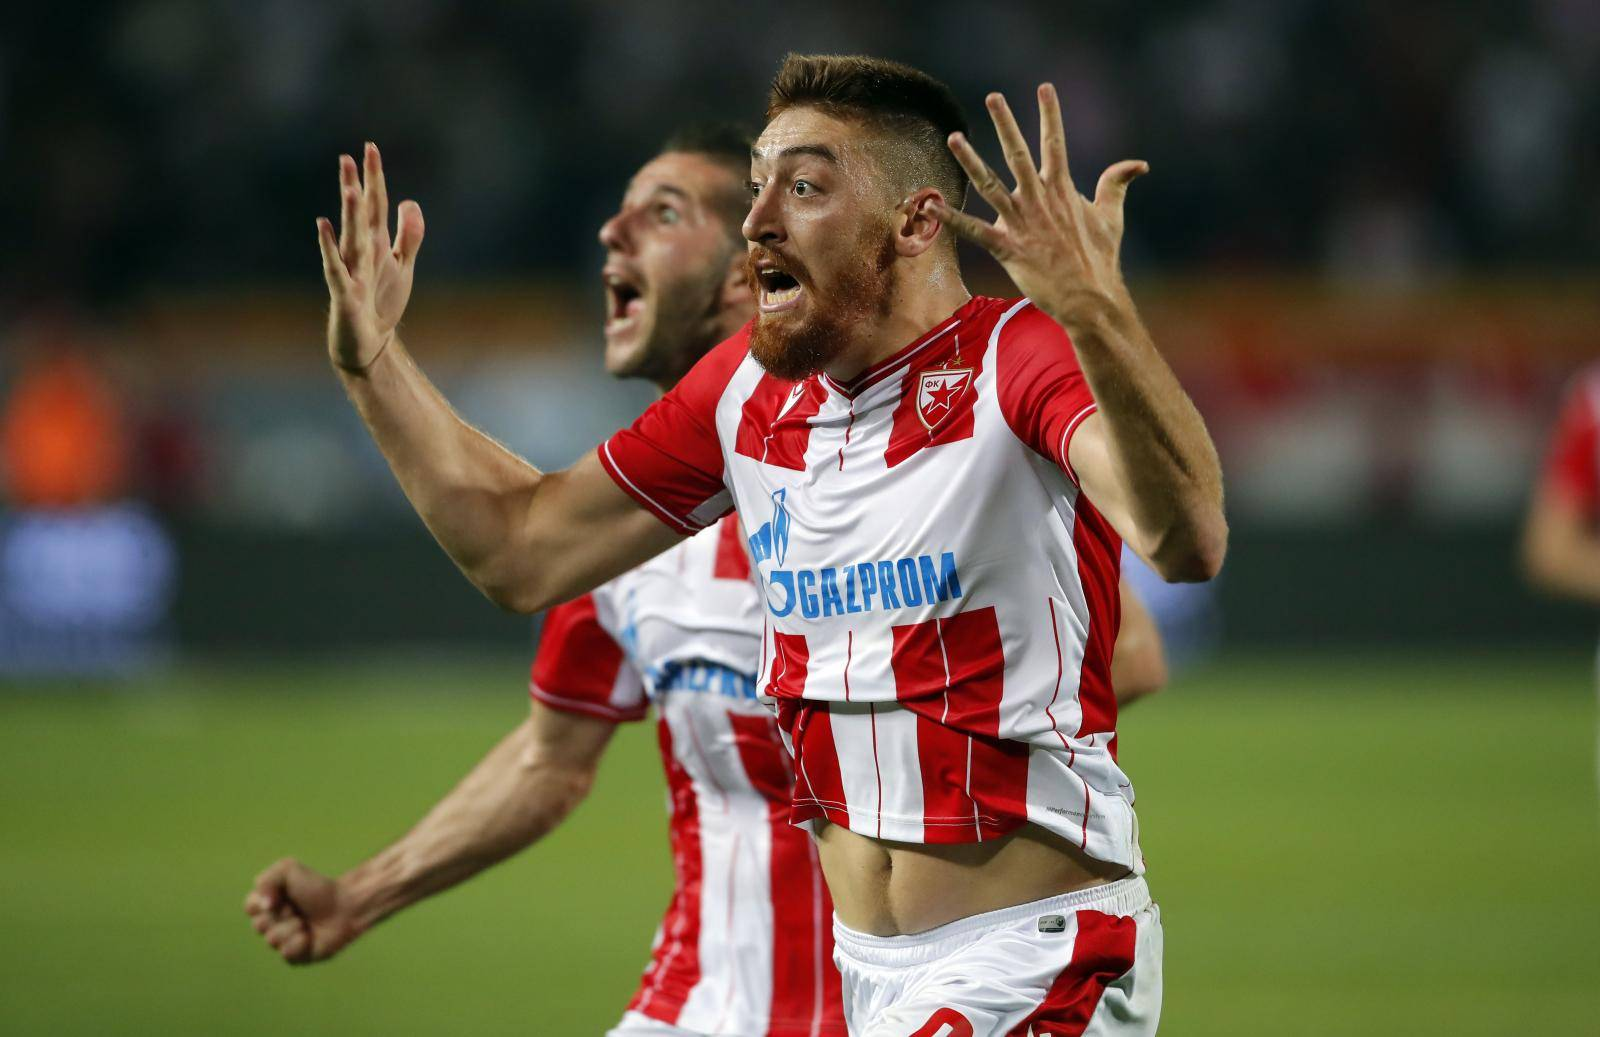 (SP)SERBIA-BELGRADE-SOCCER-UEFA CHAMPIONS LEAGUE-CRVENA ZVEZDA VS FC COPENHAGEN